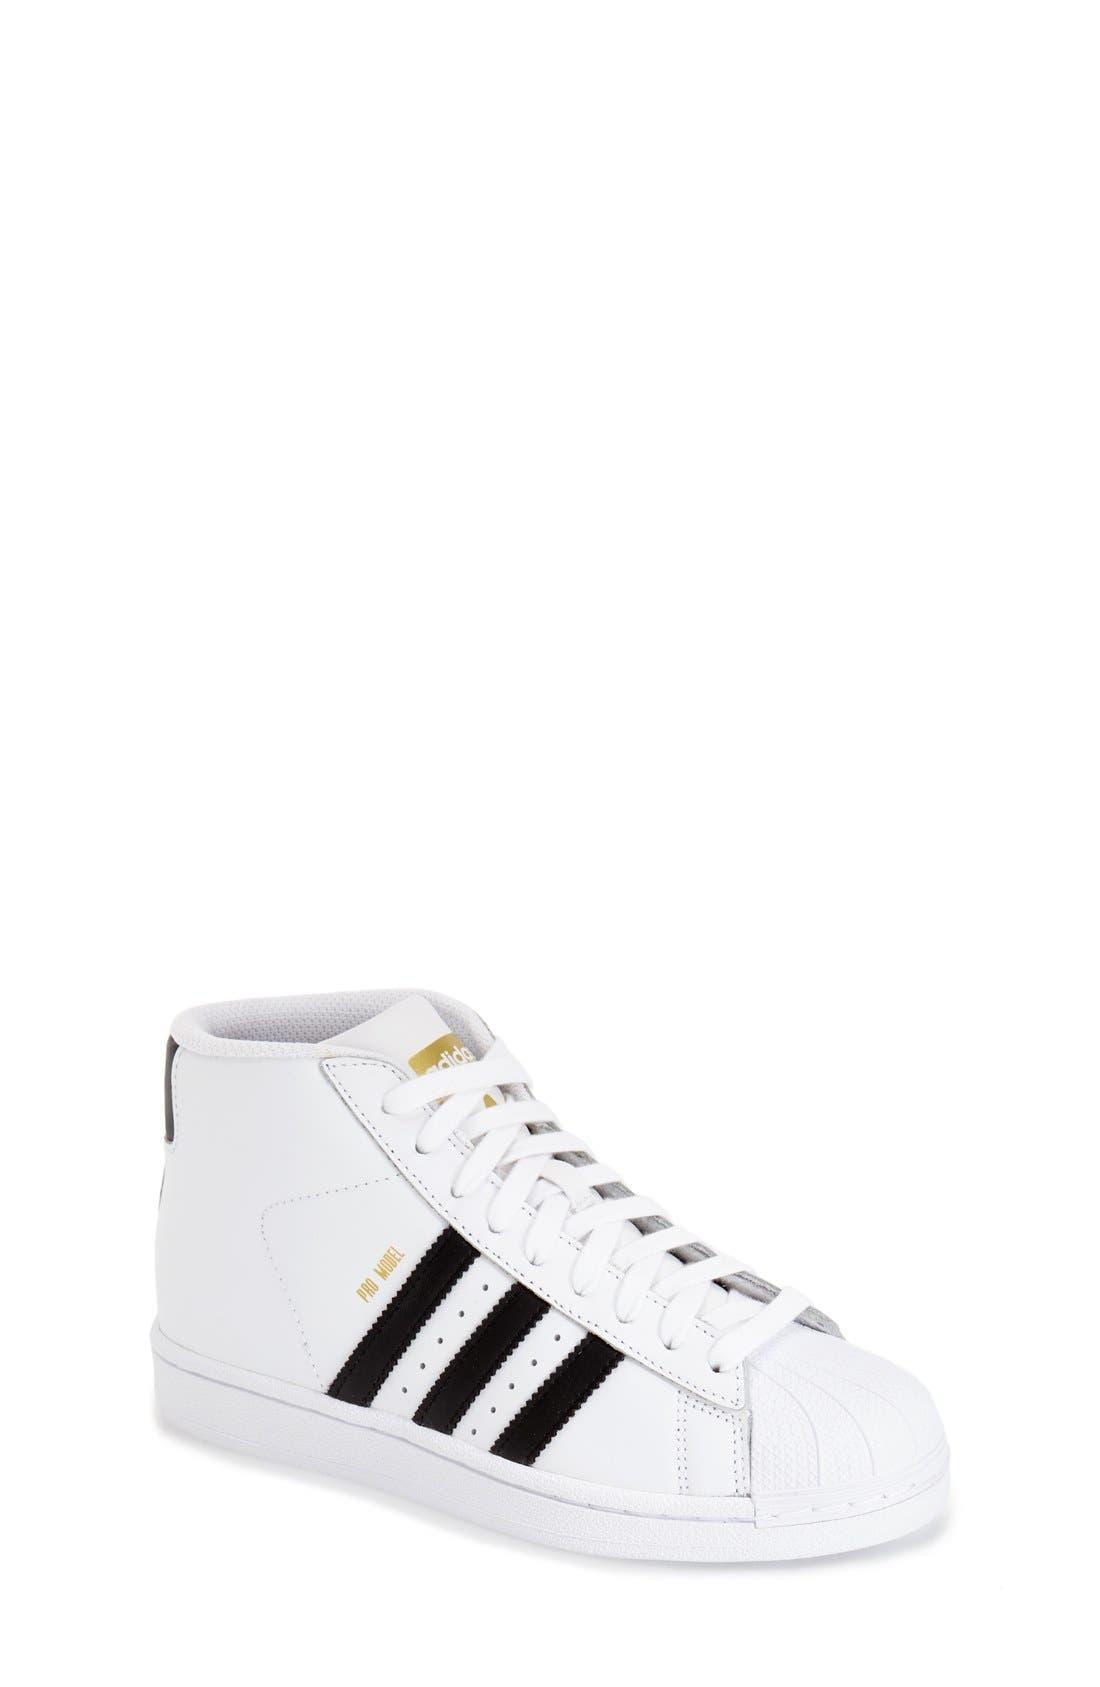 Main Image - adidas 'Pro Model' High Top Sneaker (Big Kid)